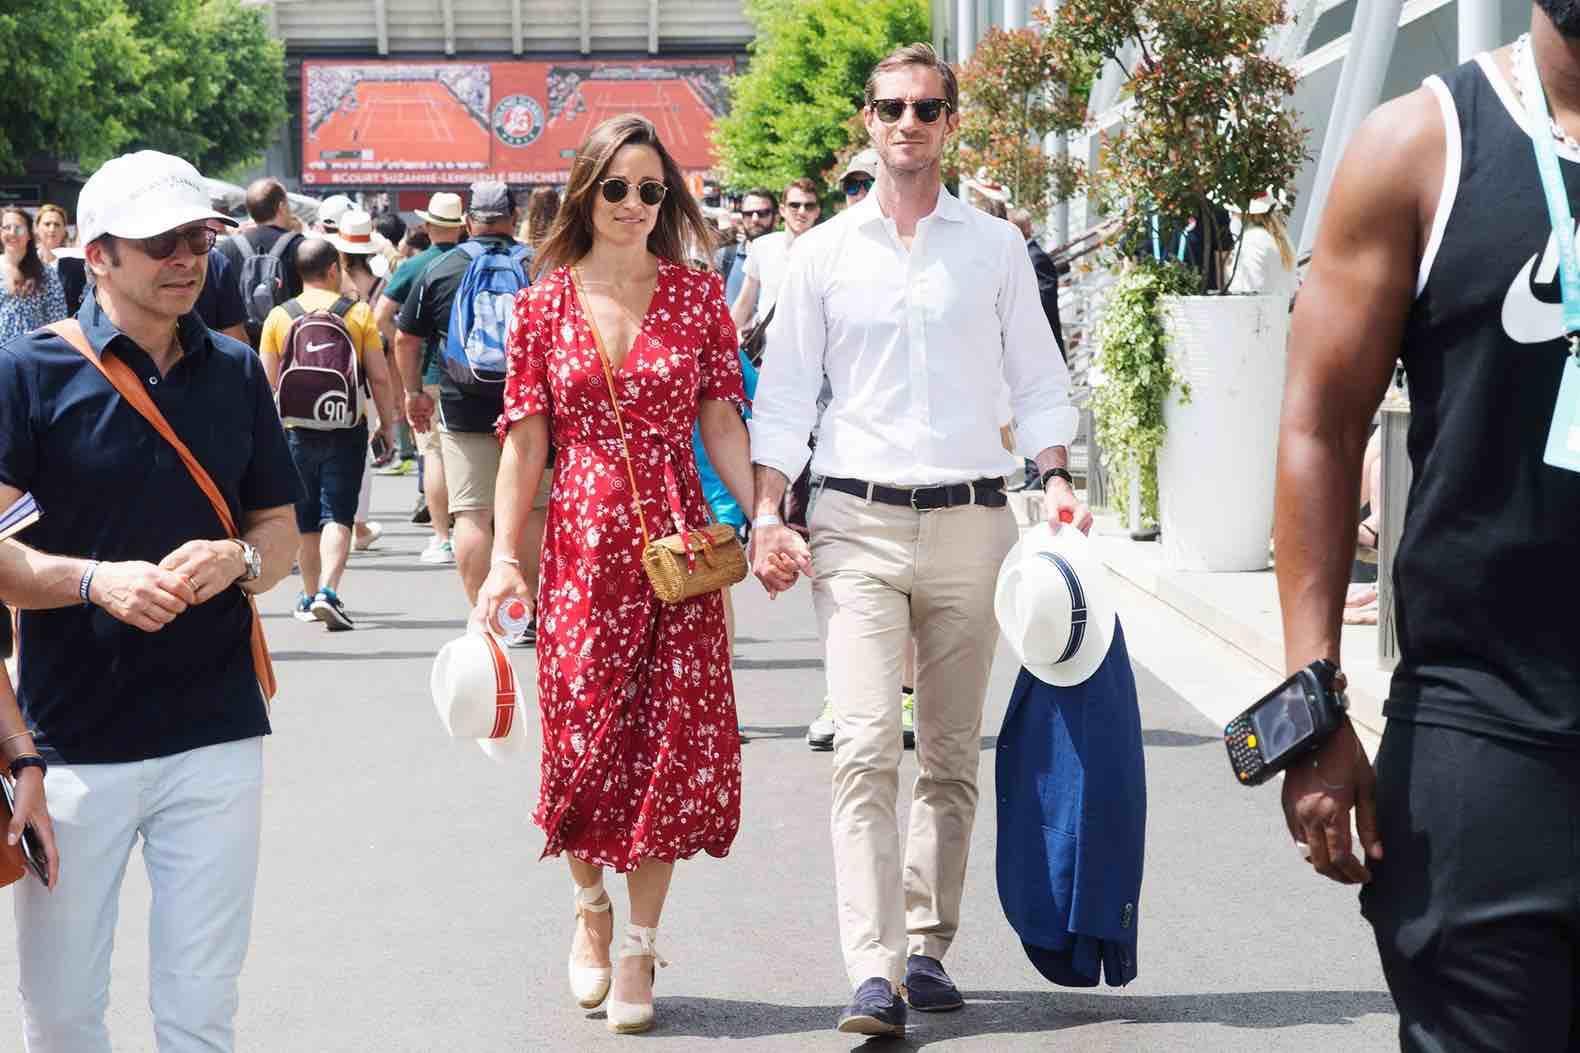 Las alpargatas españolas triunfan con la reina Letizia, Meghan Markle, Kate Middleton